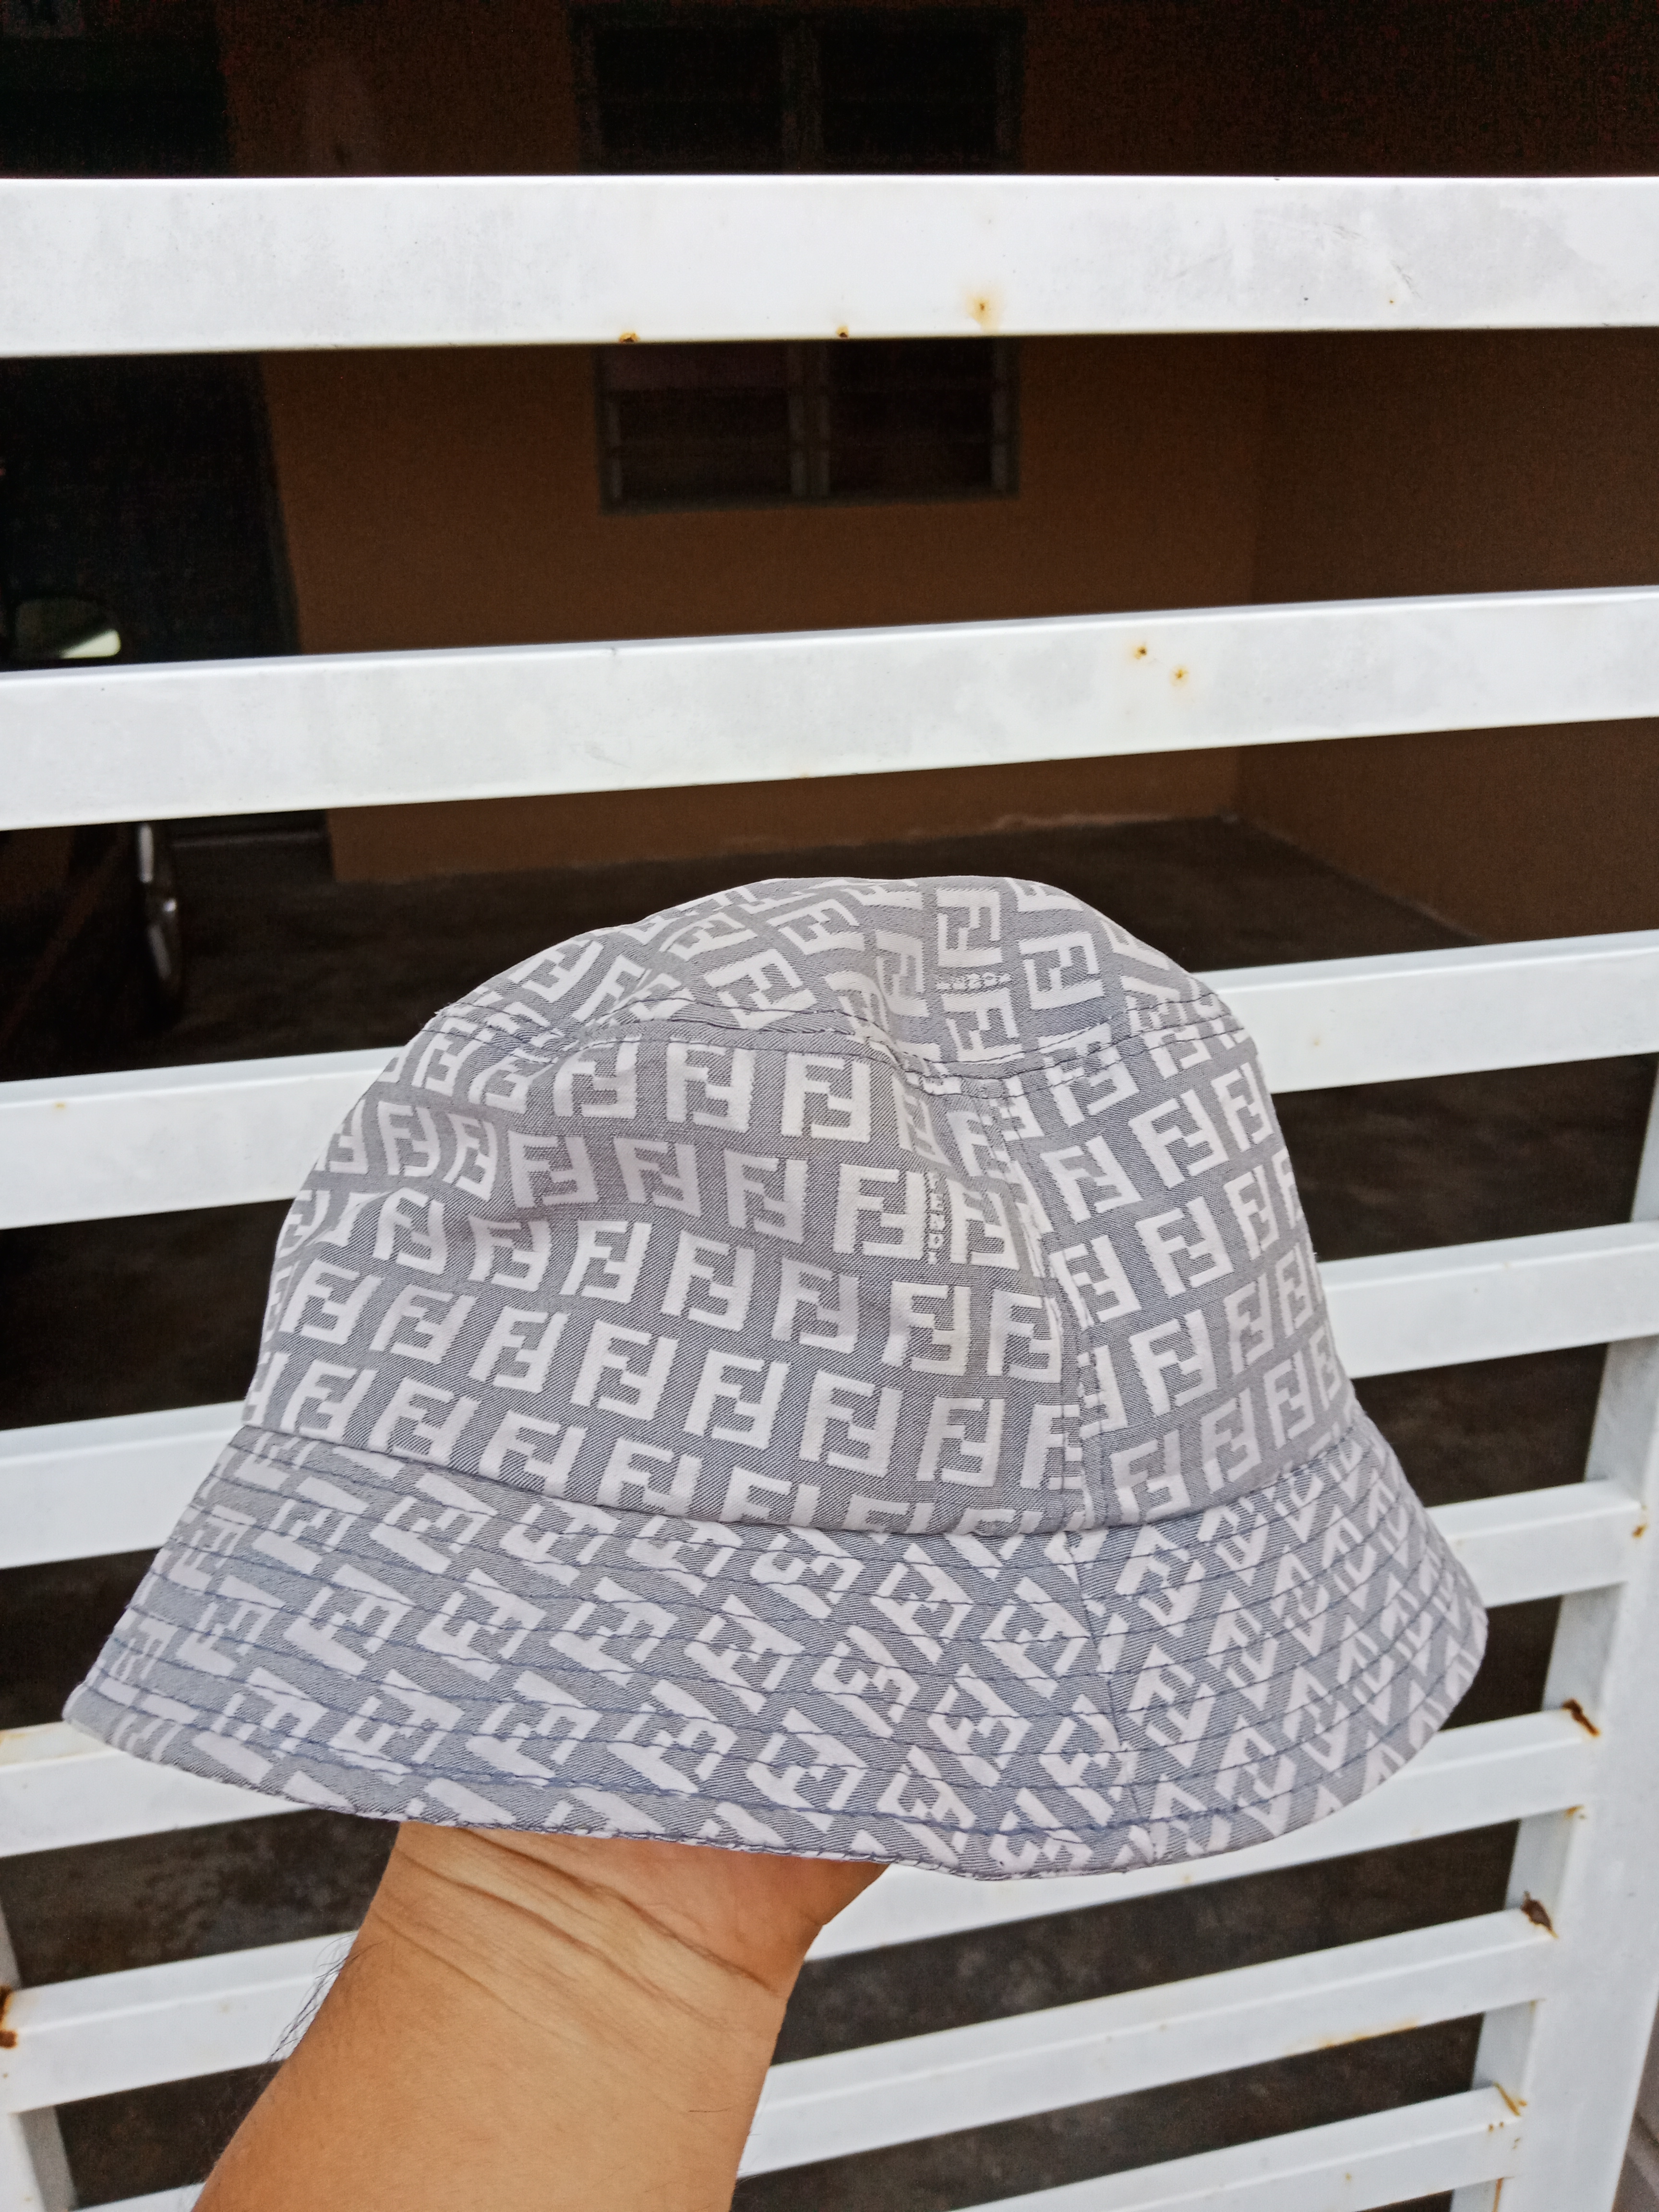 ac4edb2fea78b Fendi × Luxury ×. Luxury Fendi Monogram Spellout Fullprint Bucket Hat Made  in Italy. Size  ONE SIZE